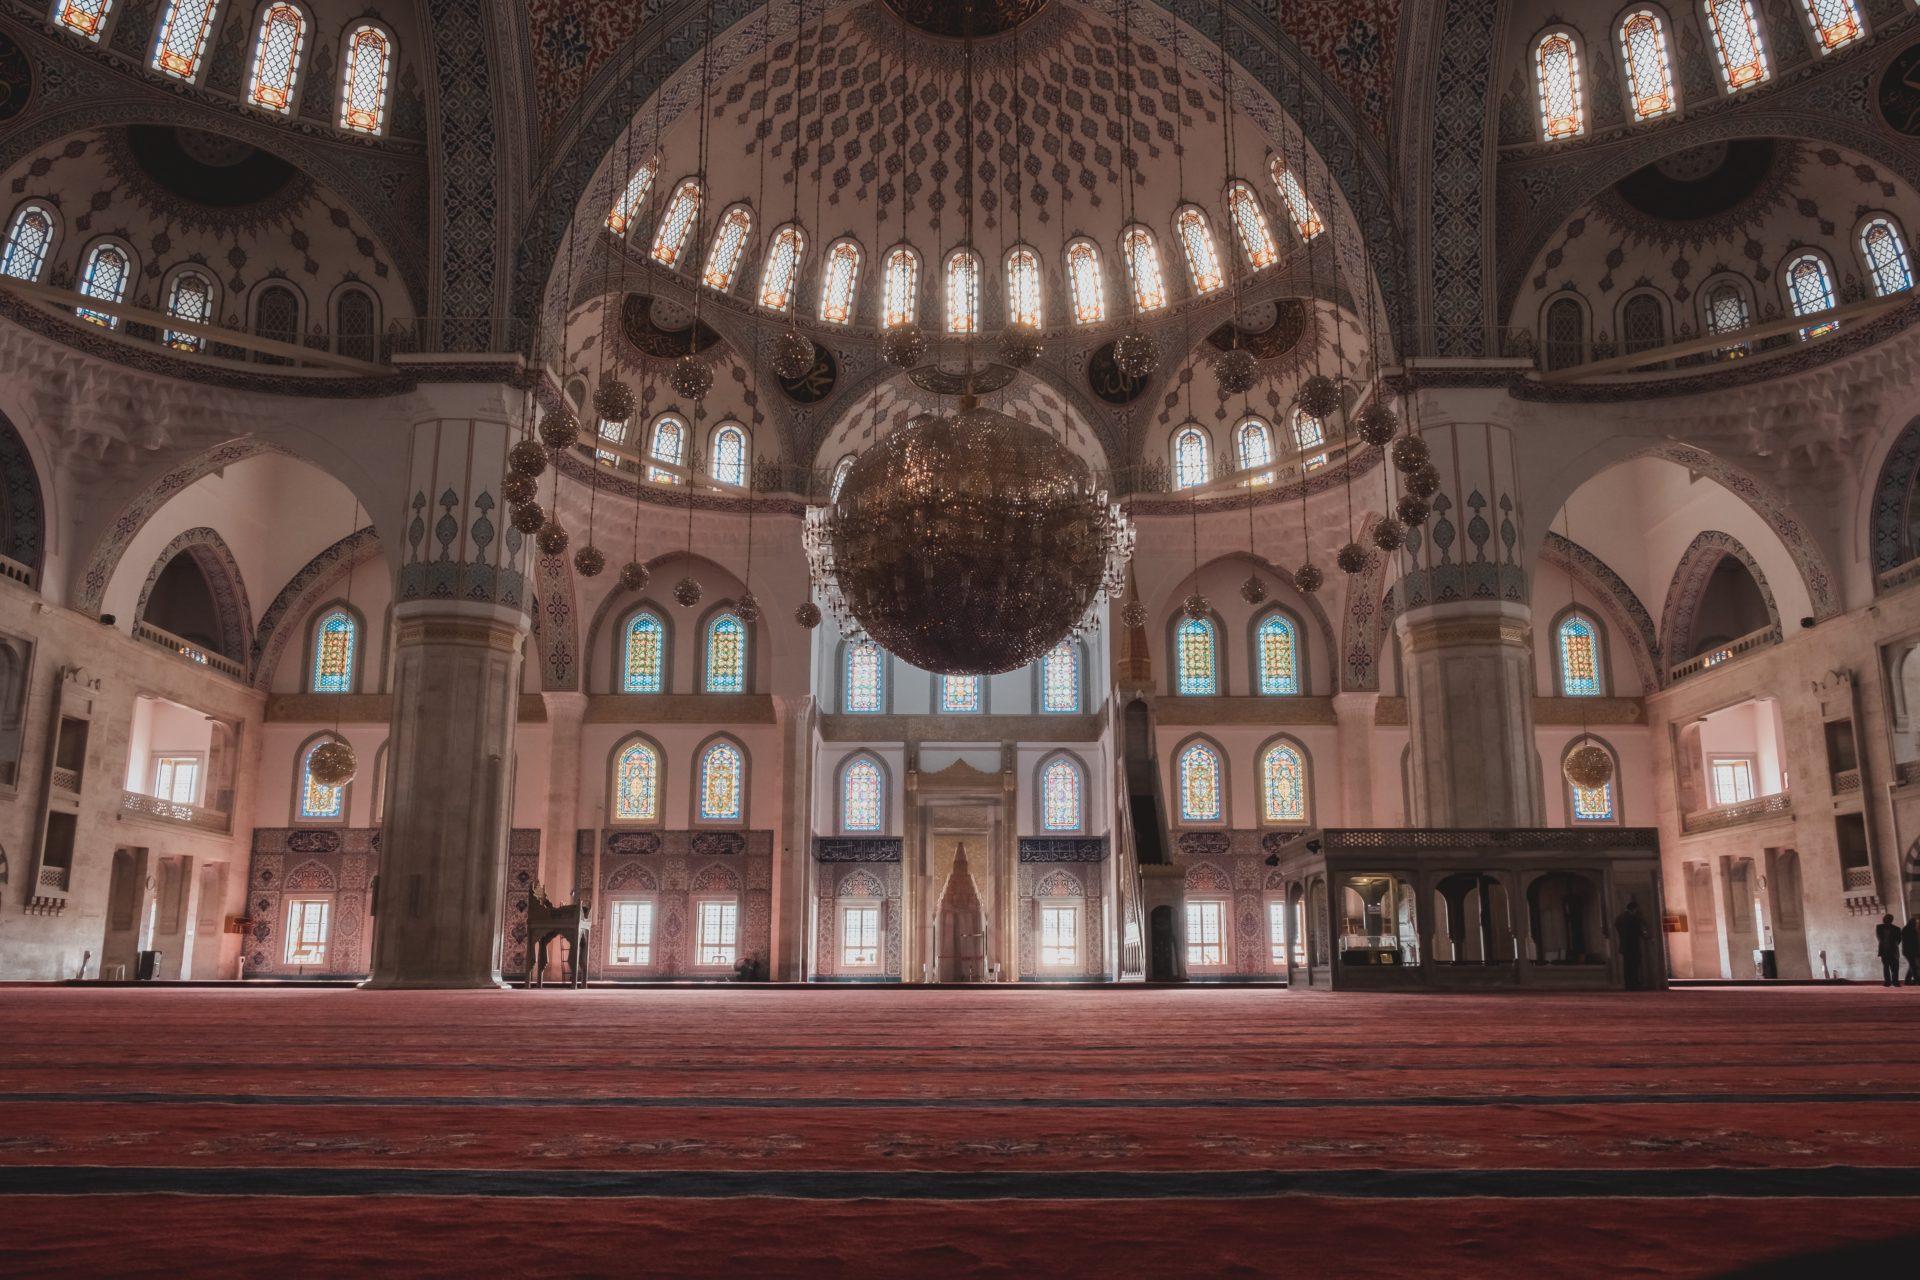 Accommodating Employees During Ramadan